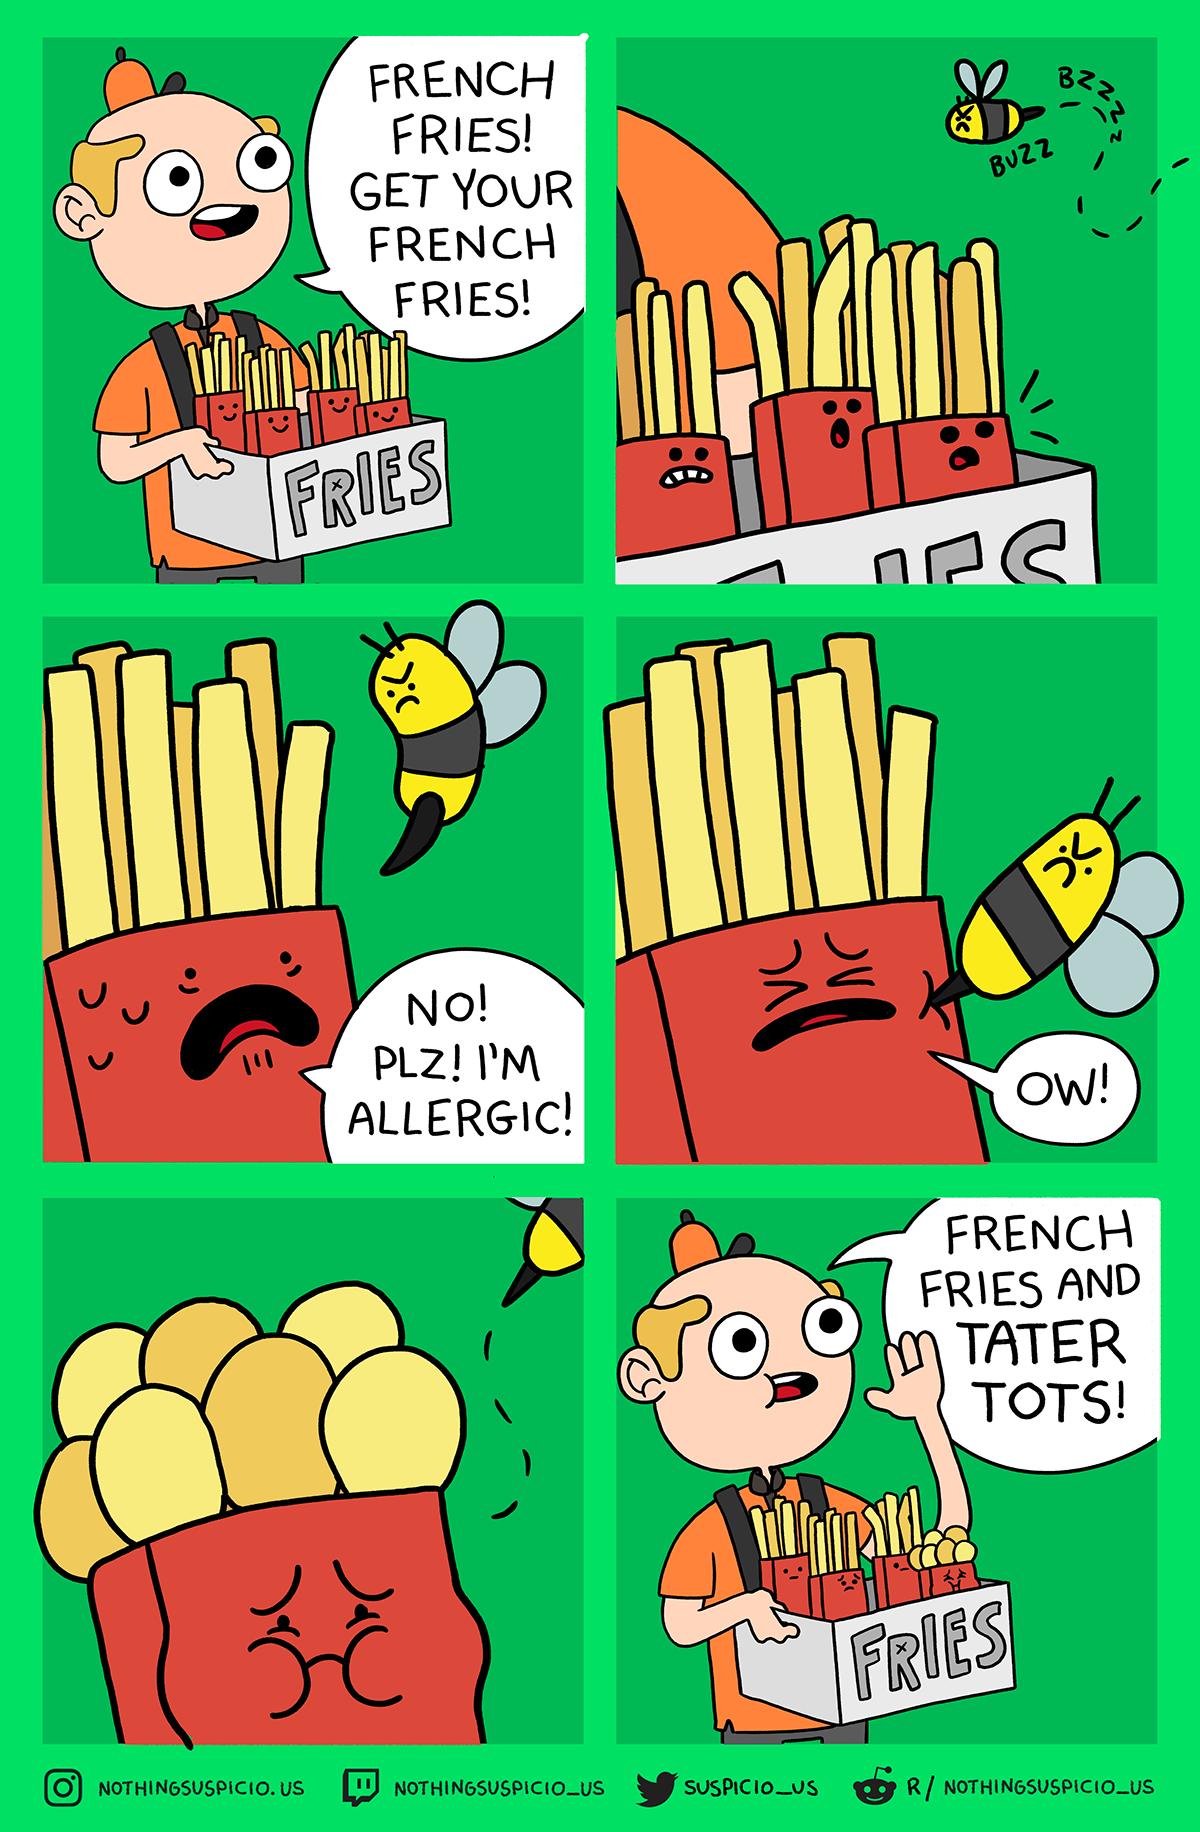 comics webcomics Cartoons funny humor gags comic strips Nothing Suspicious Ryan Selvy